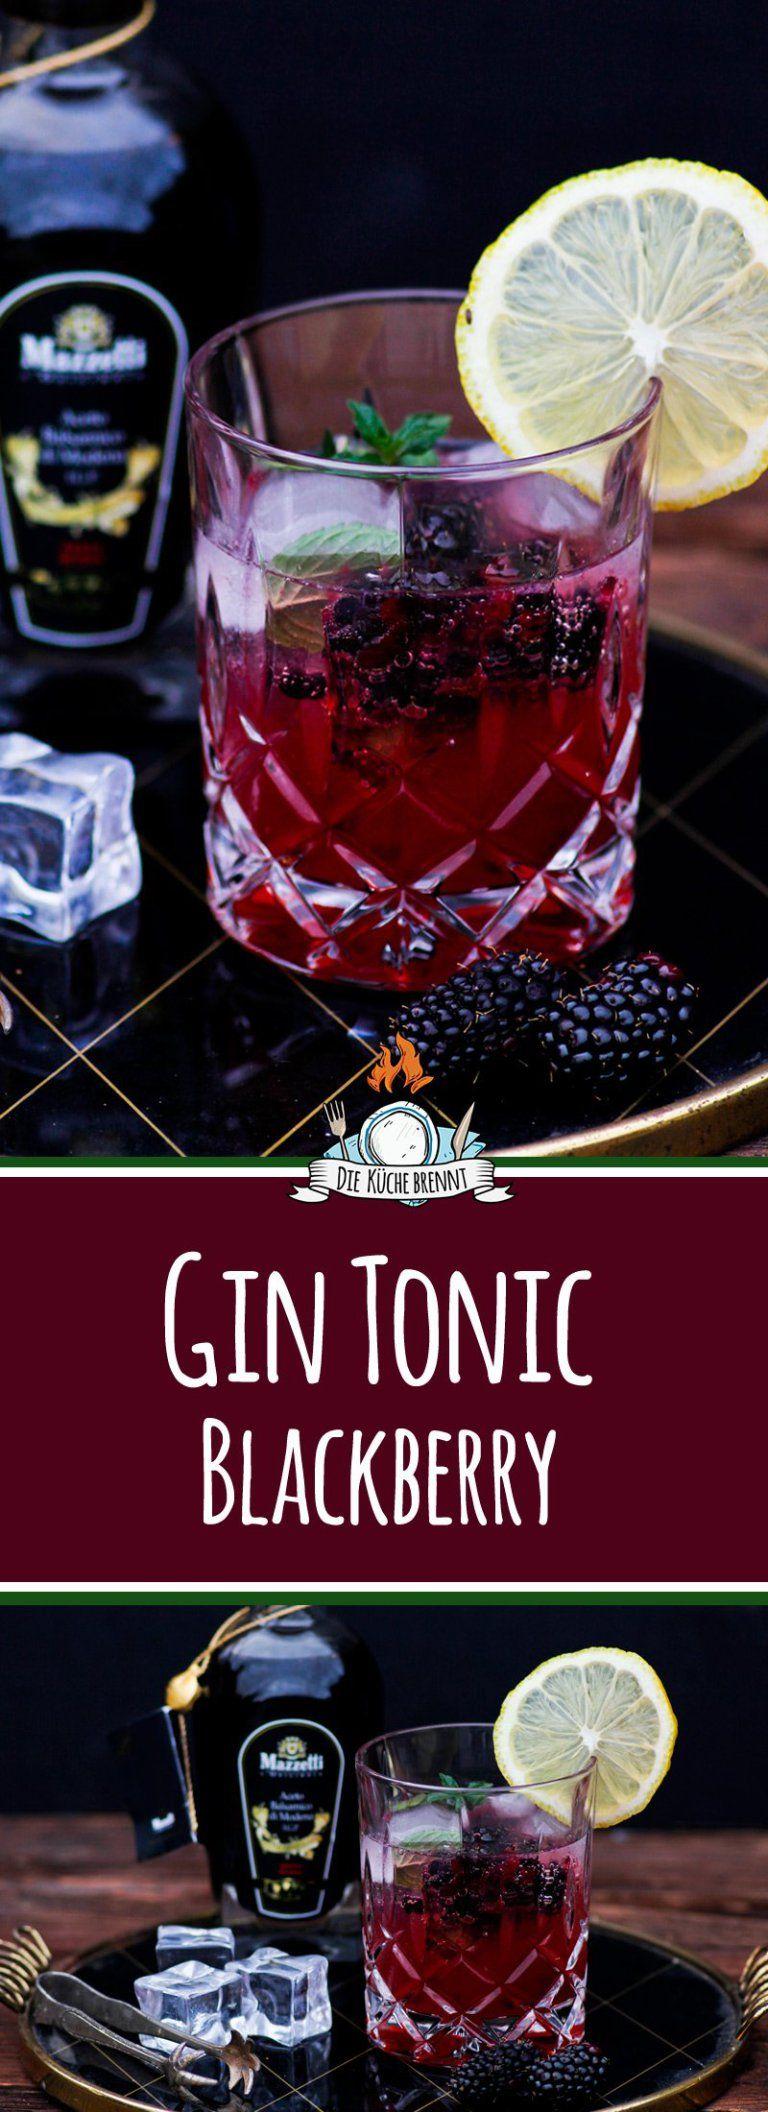 Gin Tonic Blackberry Lemon mit Mazzetti l'originale #cocktaildrinks